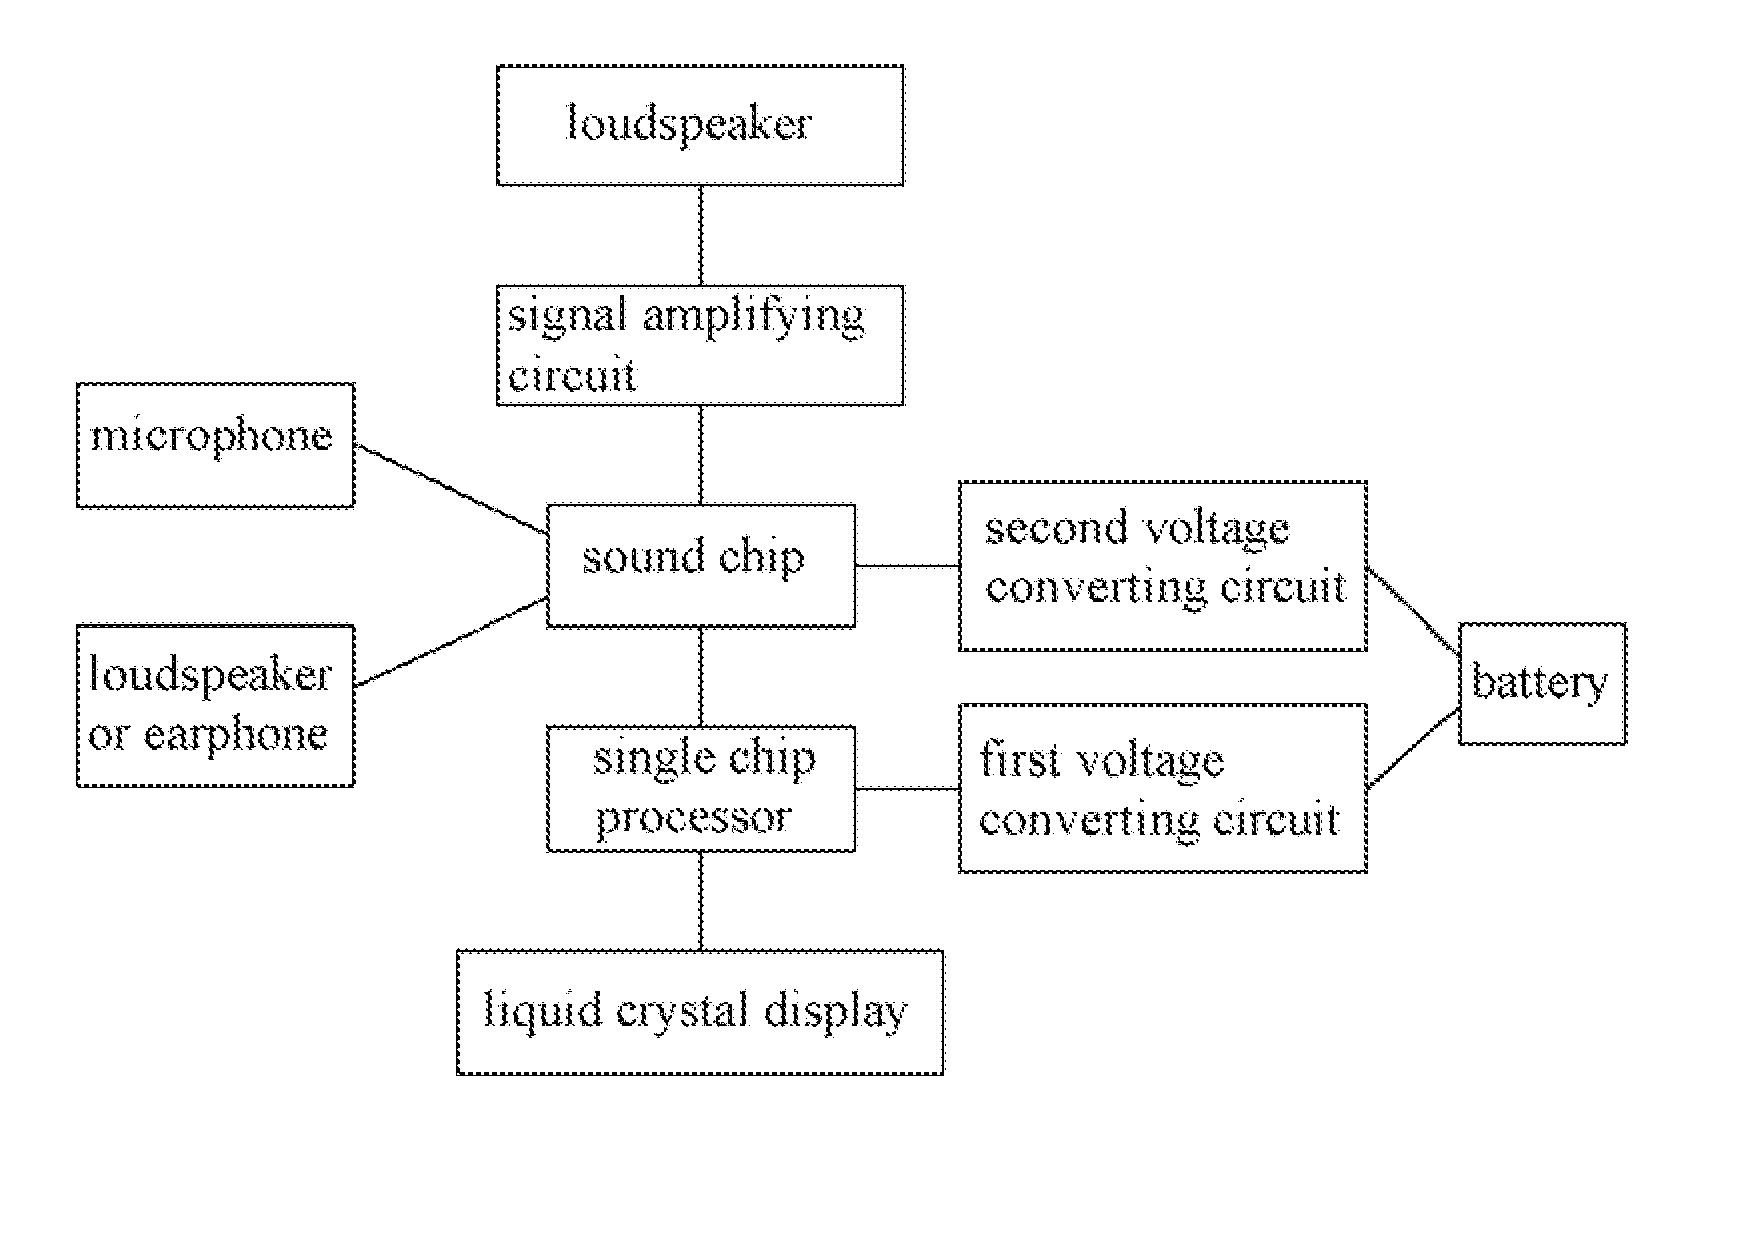 Digital Multimeter Block Diagram Schematic Icl7106 Voltmeter Circuit Download